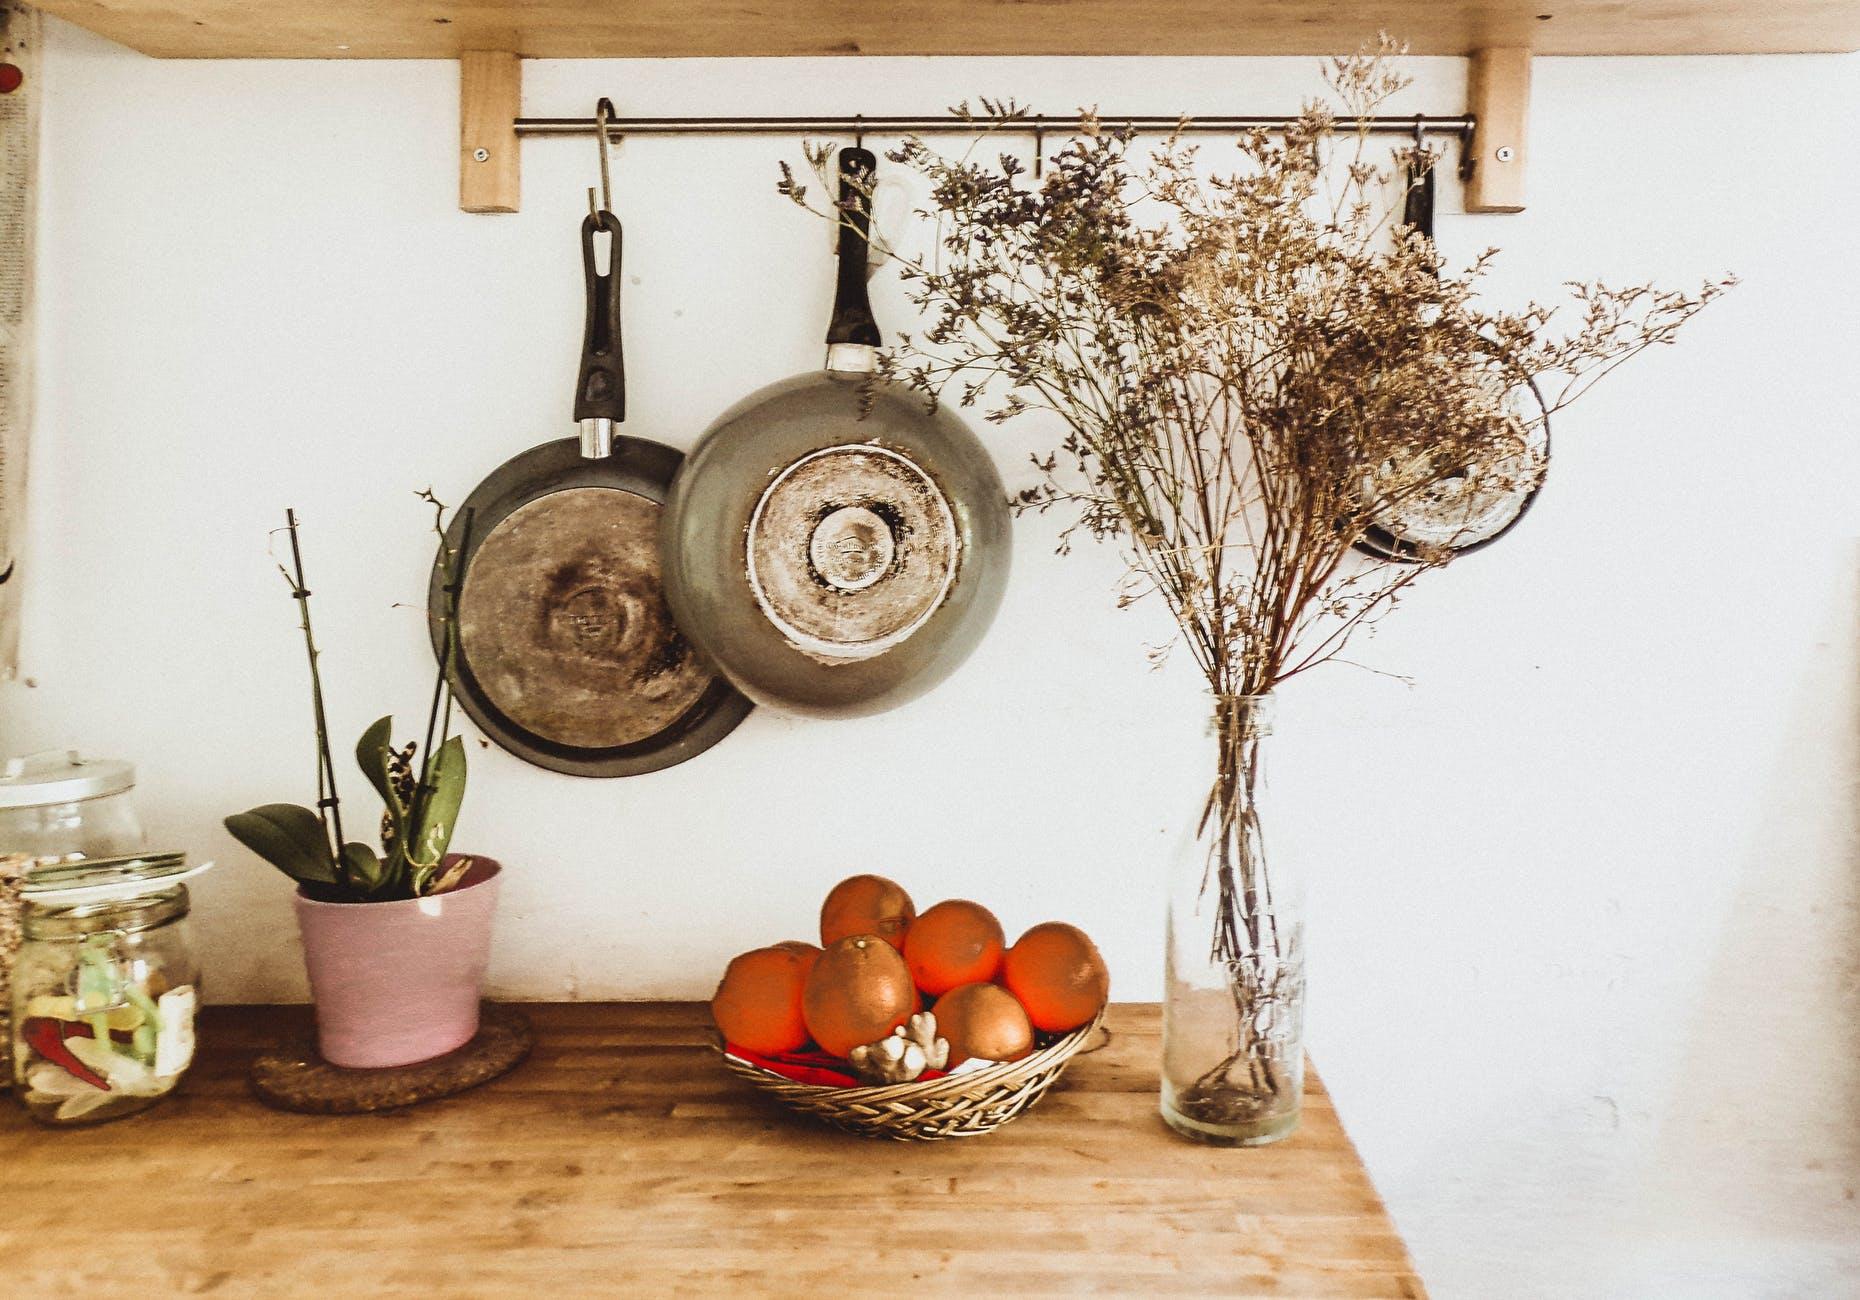 Arredare una cucina lunga e stretta: i mobili adatti ...